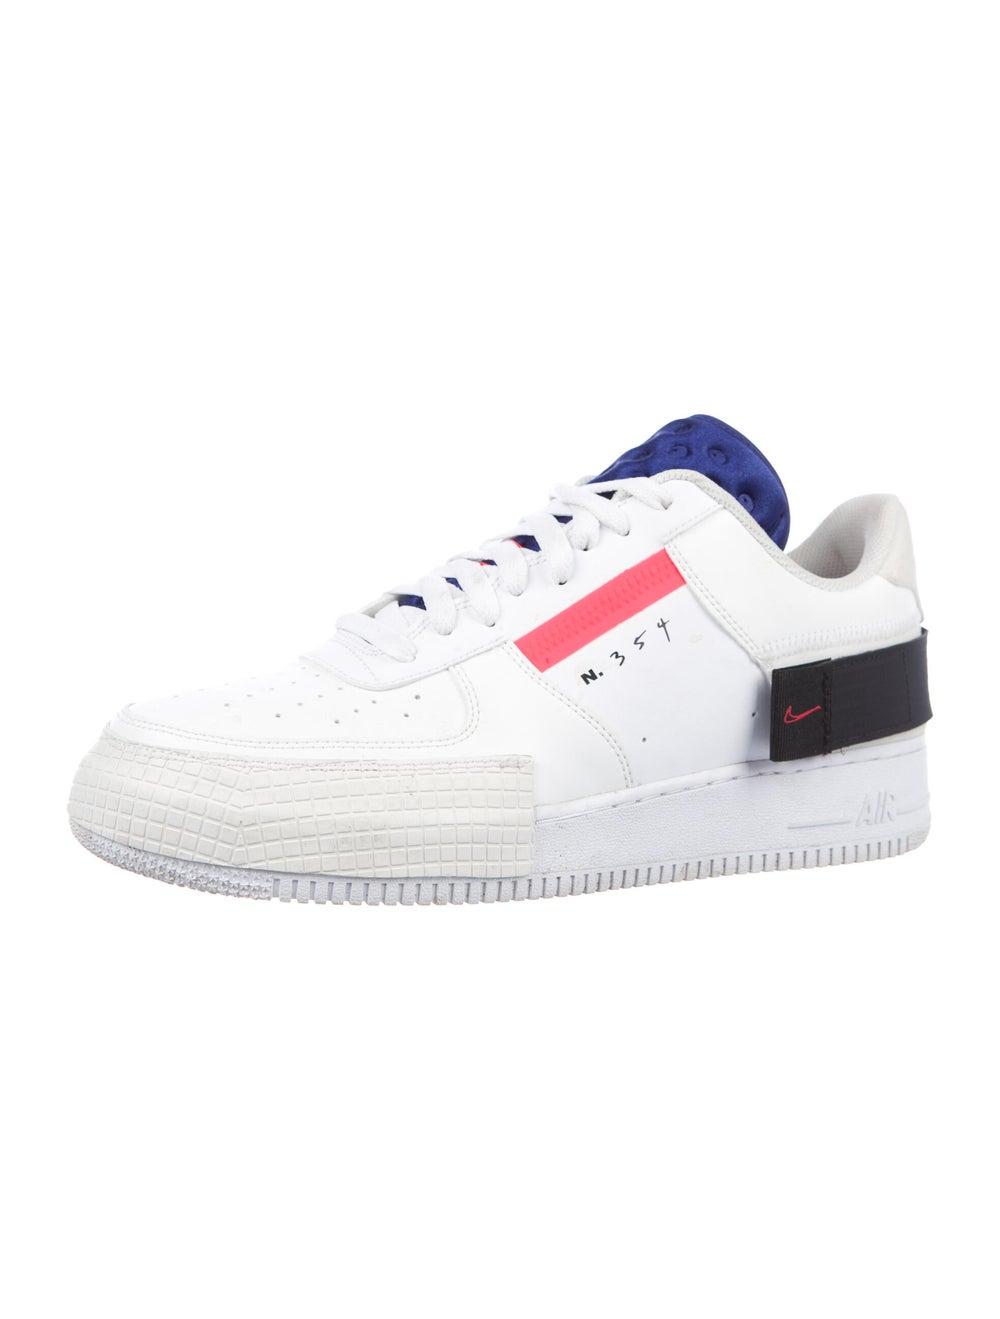 Nike Air Force 1 Type Sneakers - image 2